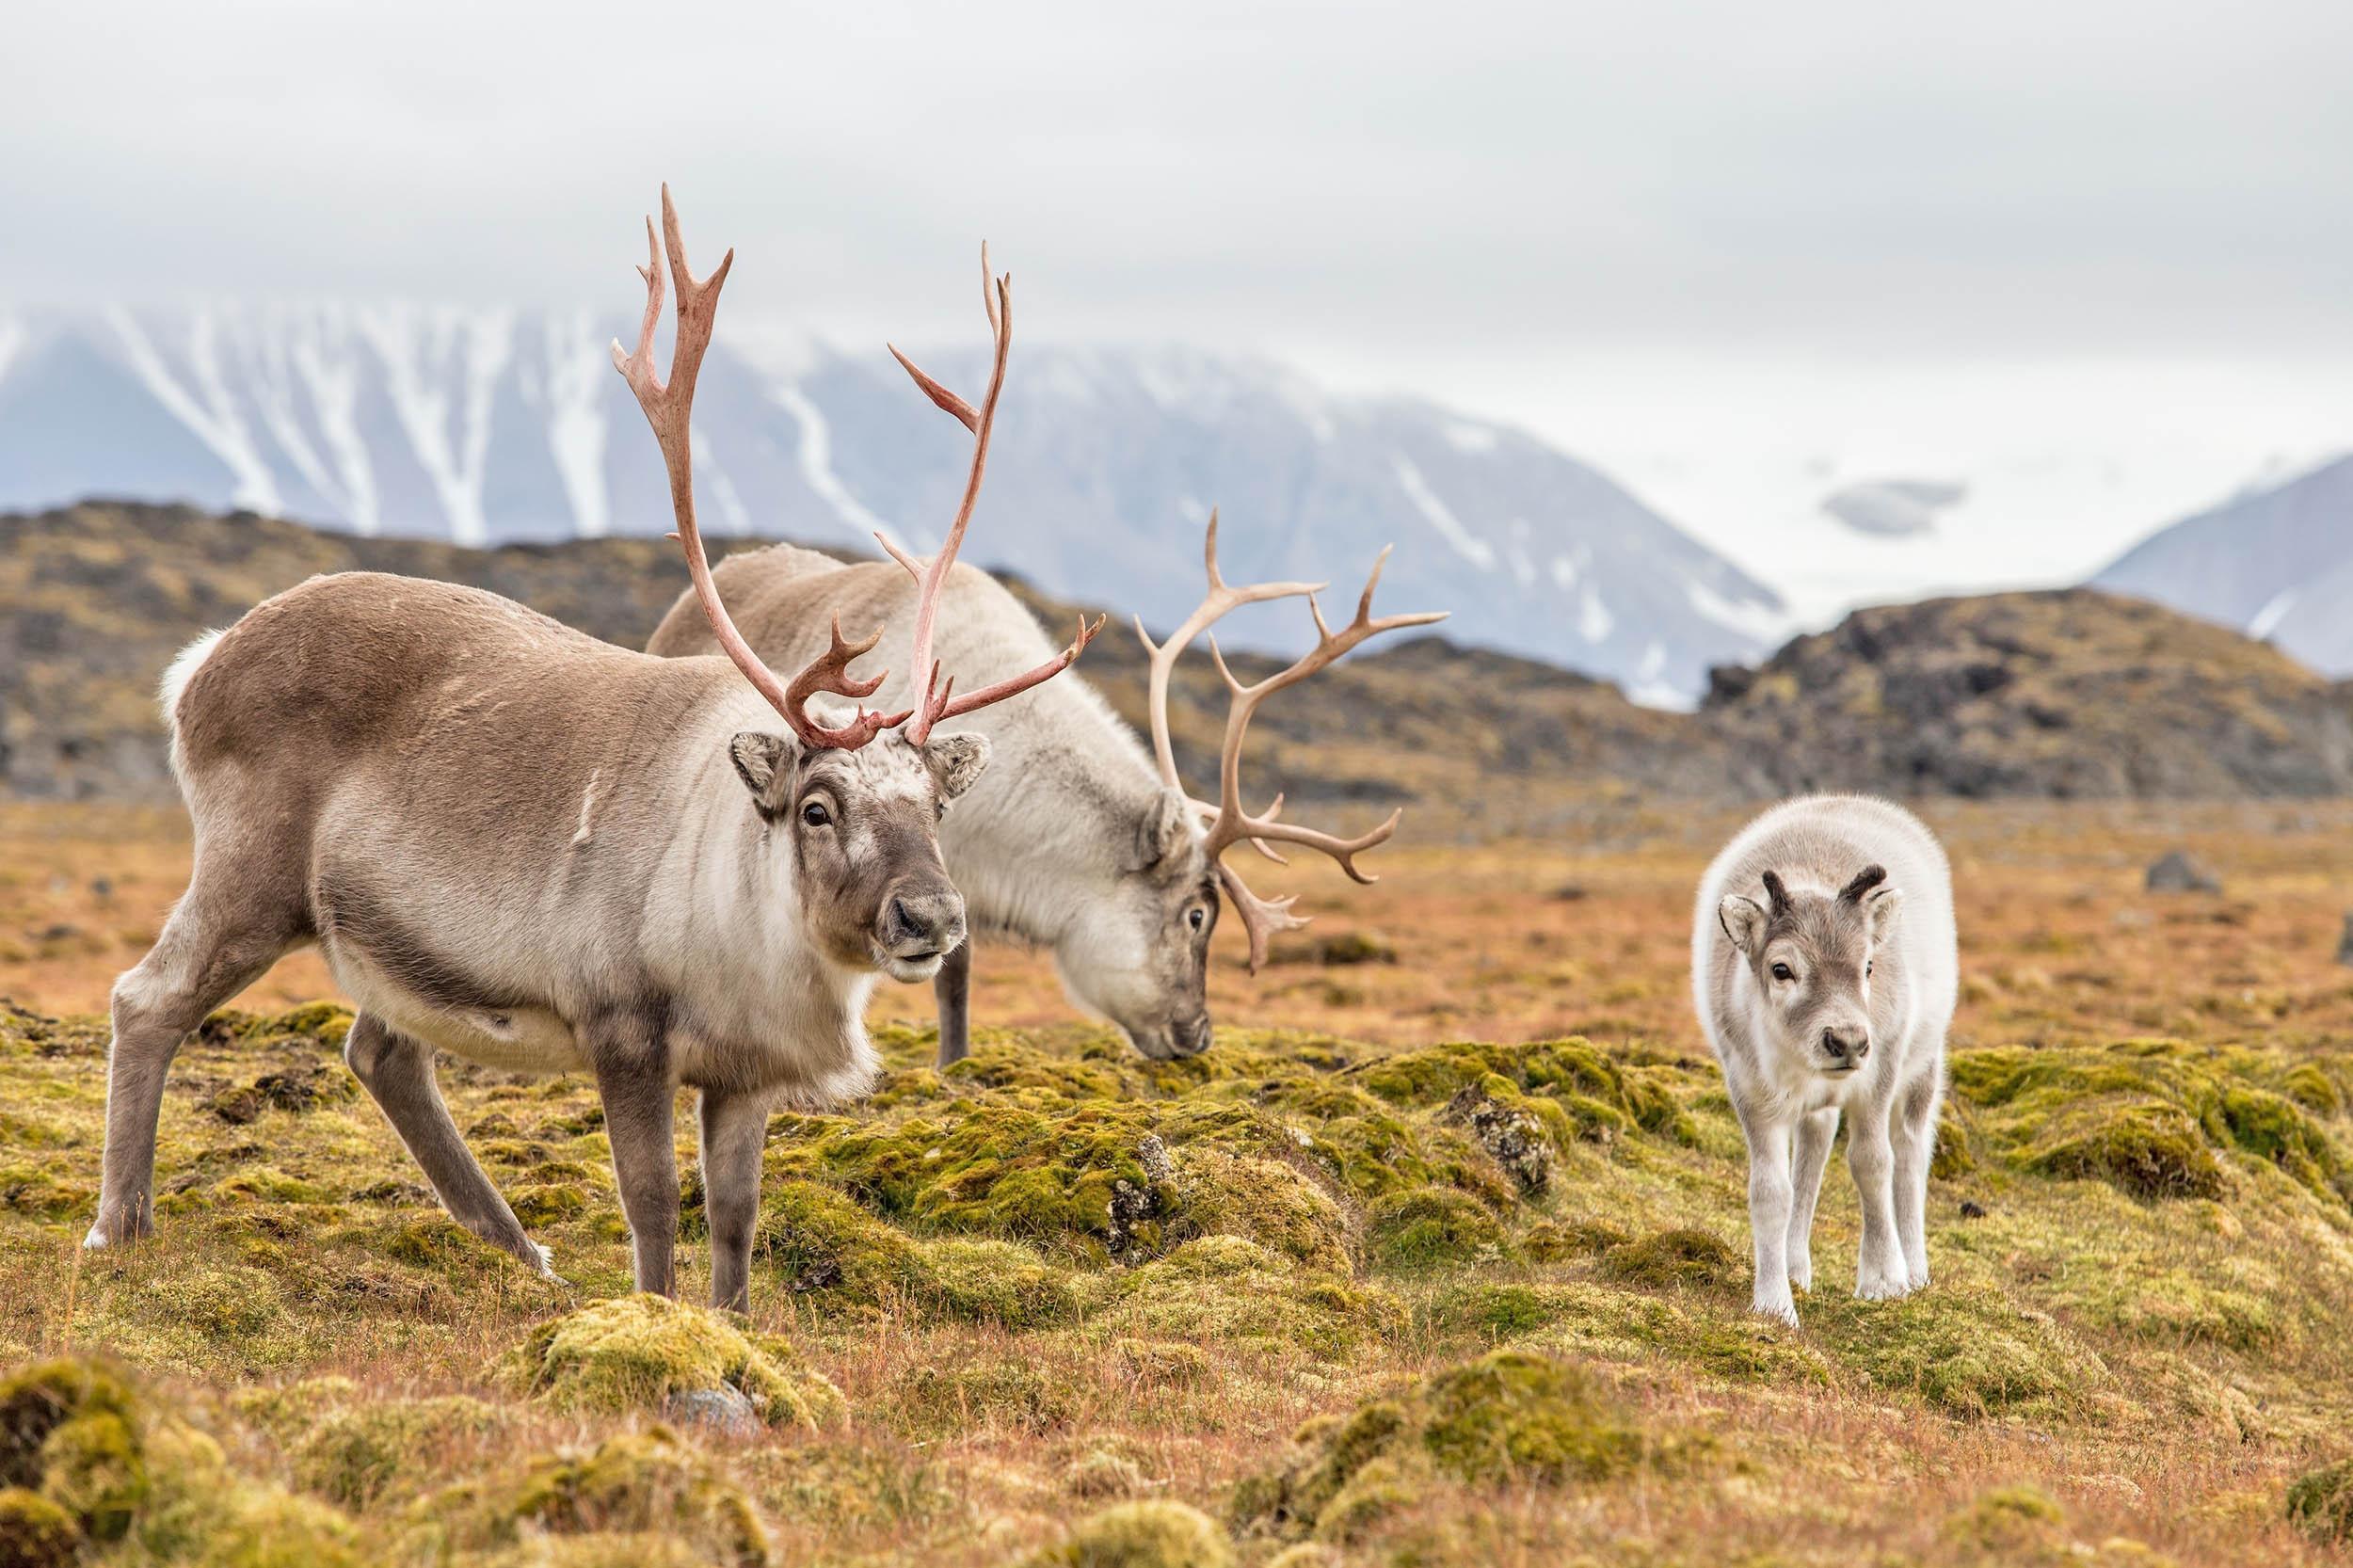 Reindeer in Siberia